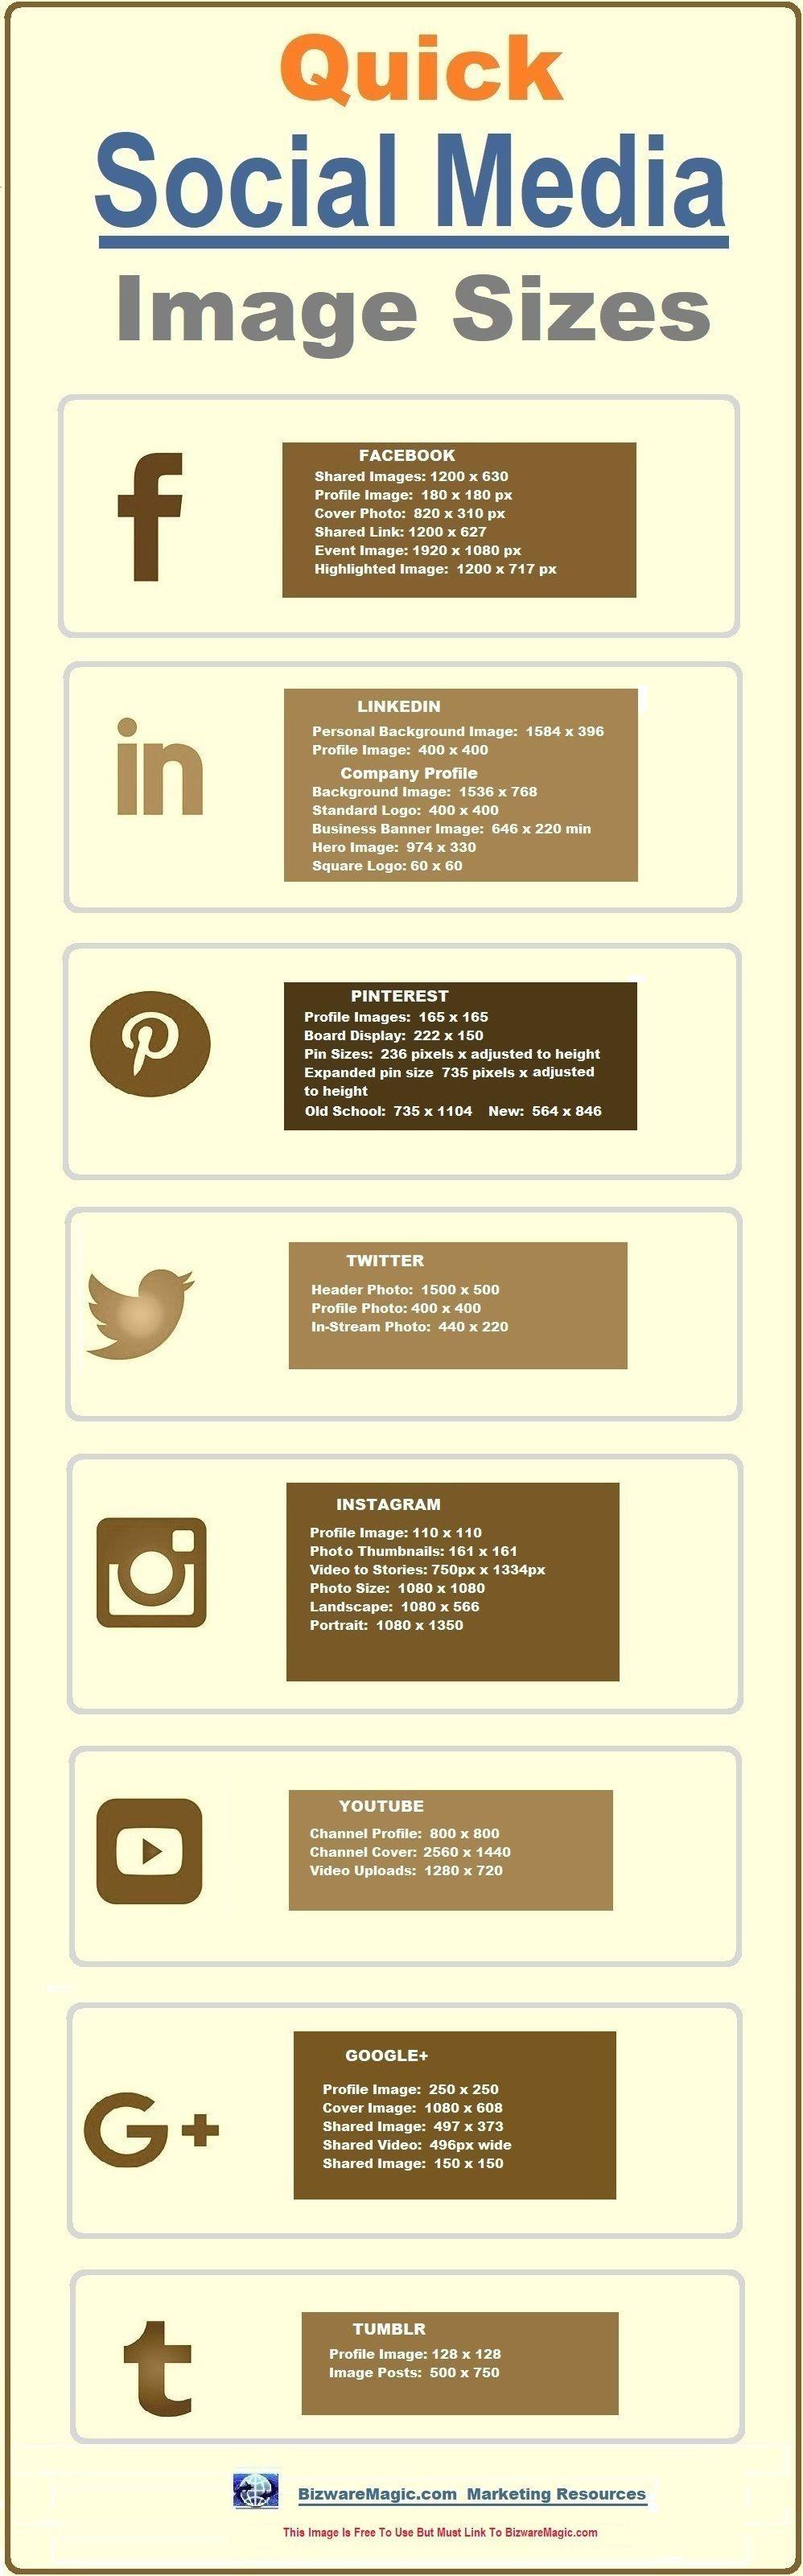 Quick Social Media Image Sizes 2018 Cheat Sheet